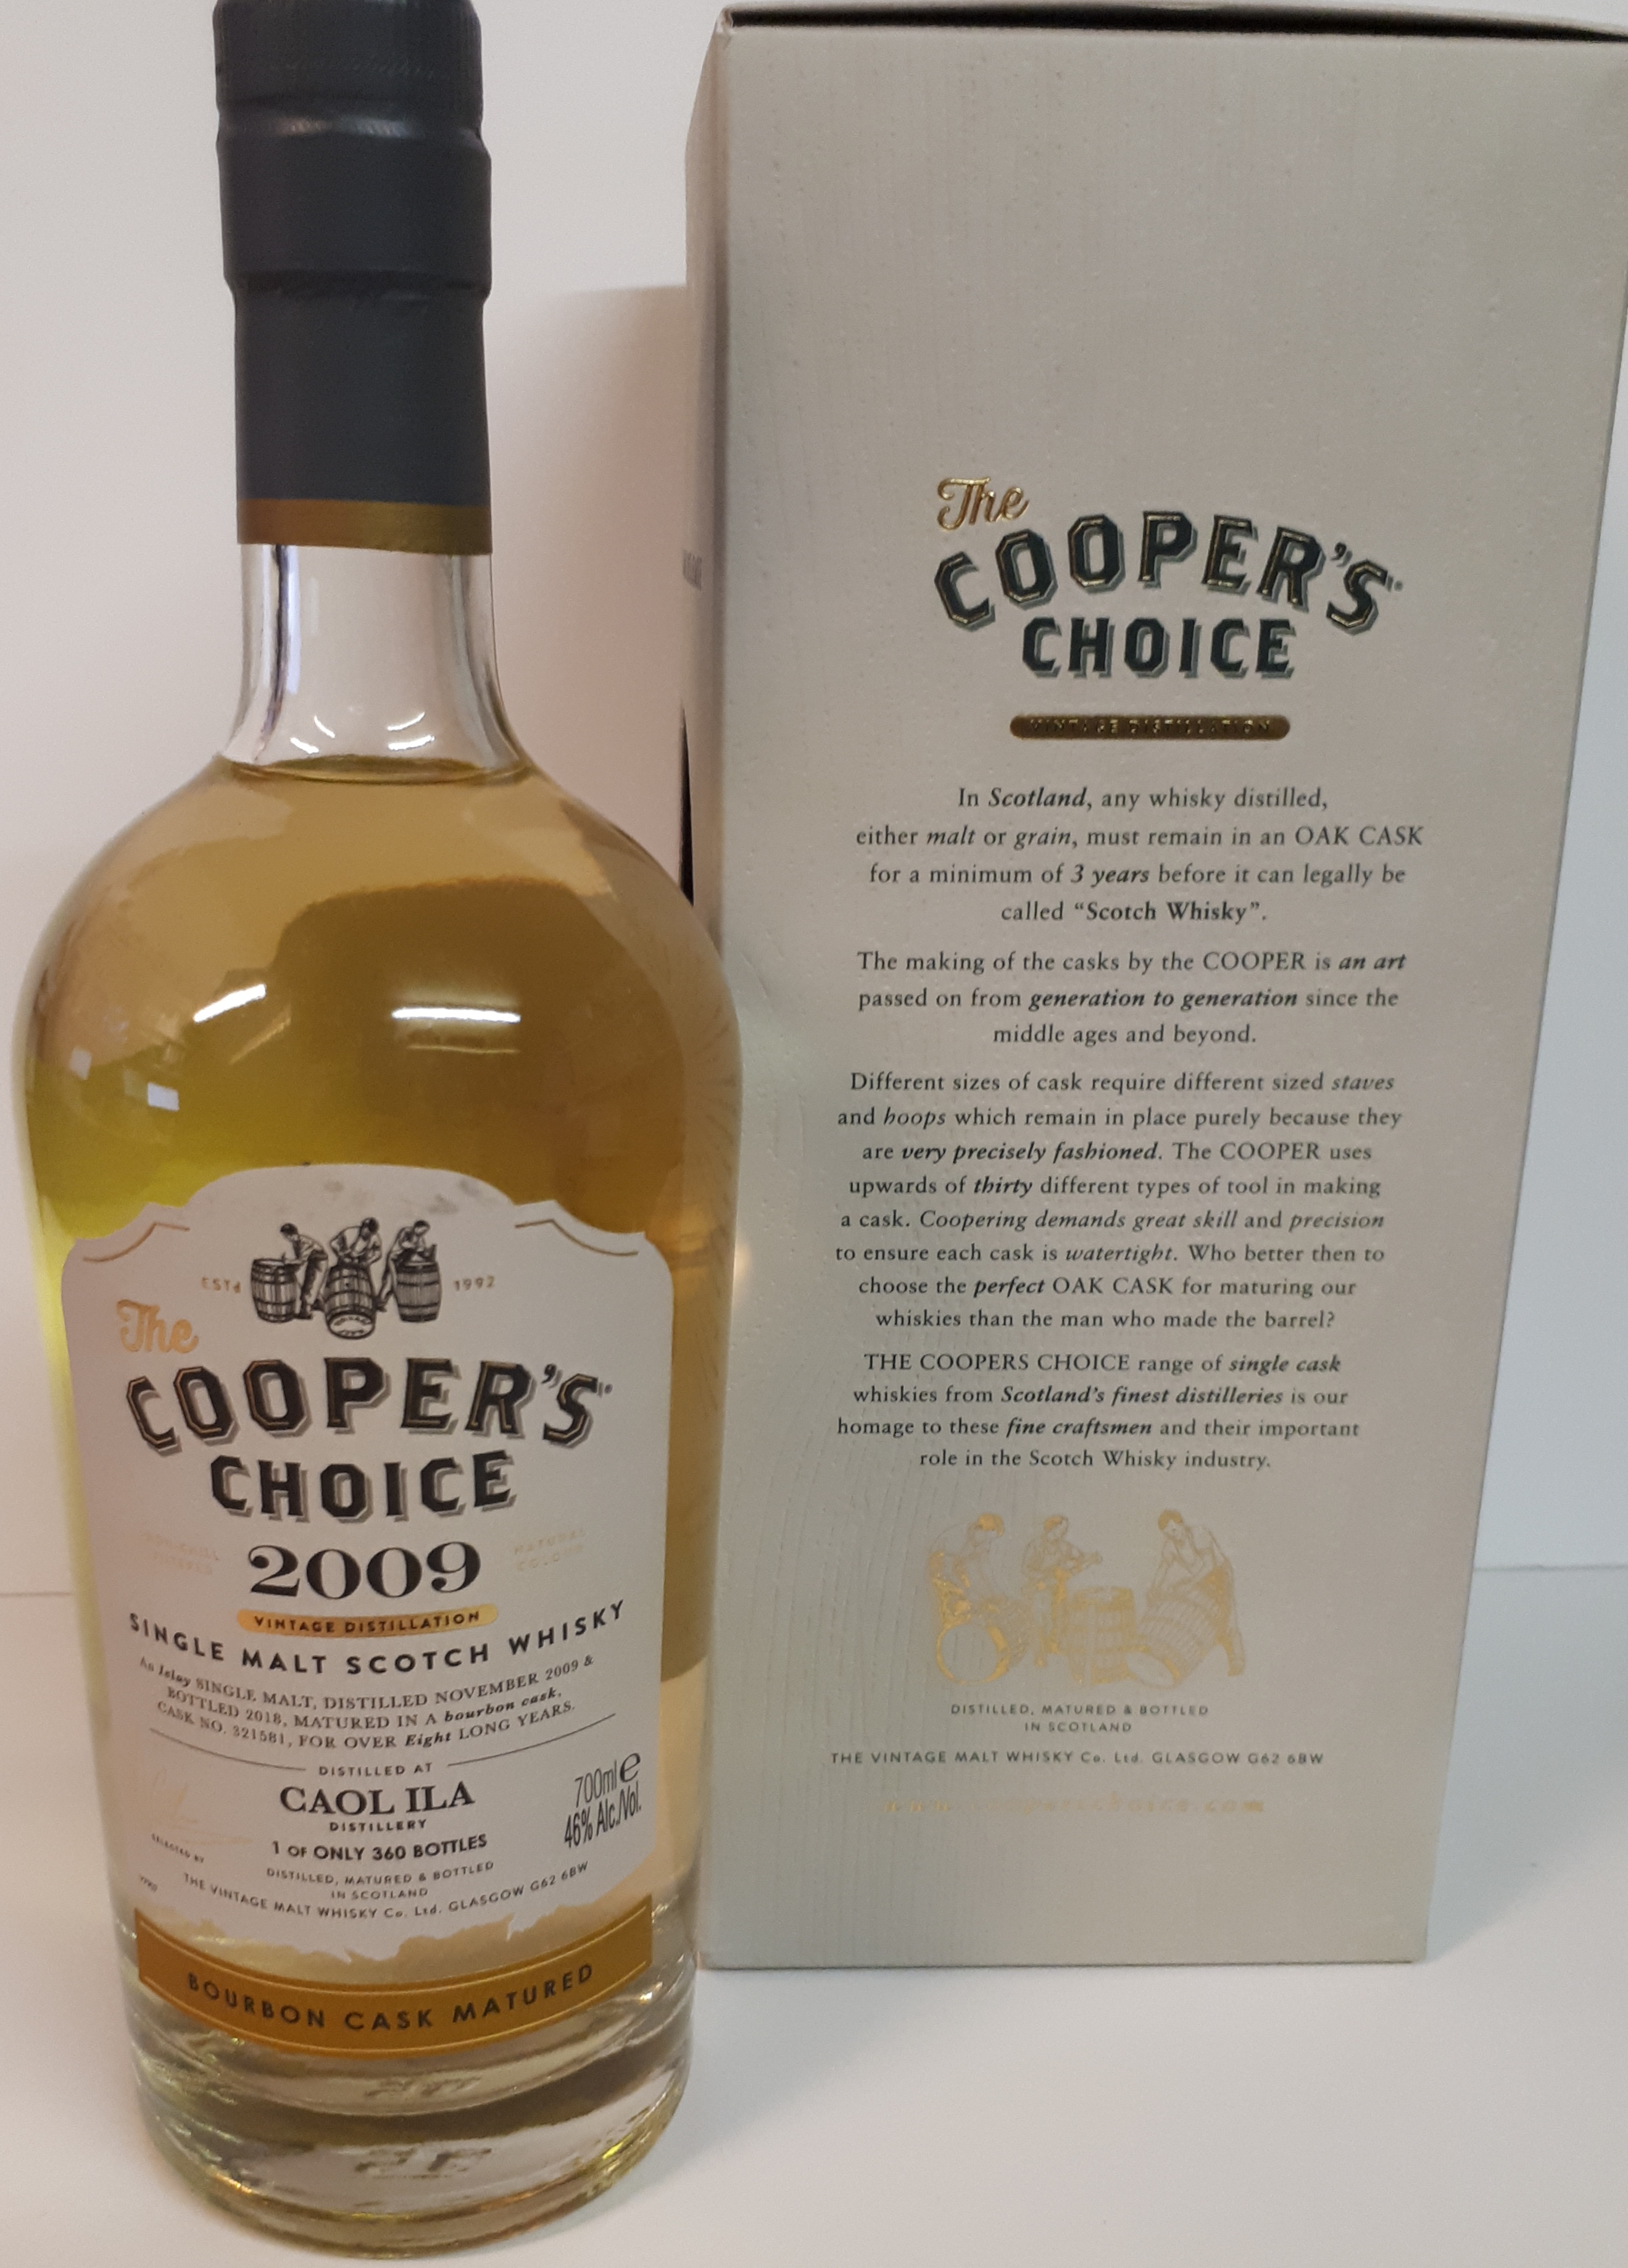 Caol Ila 2009 Coopers Choice